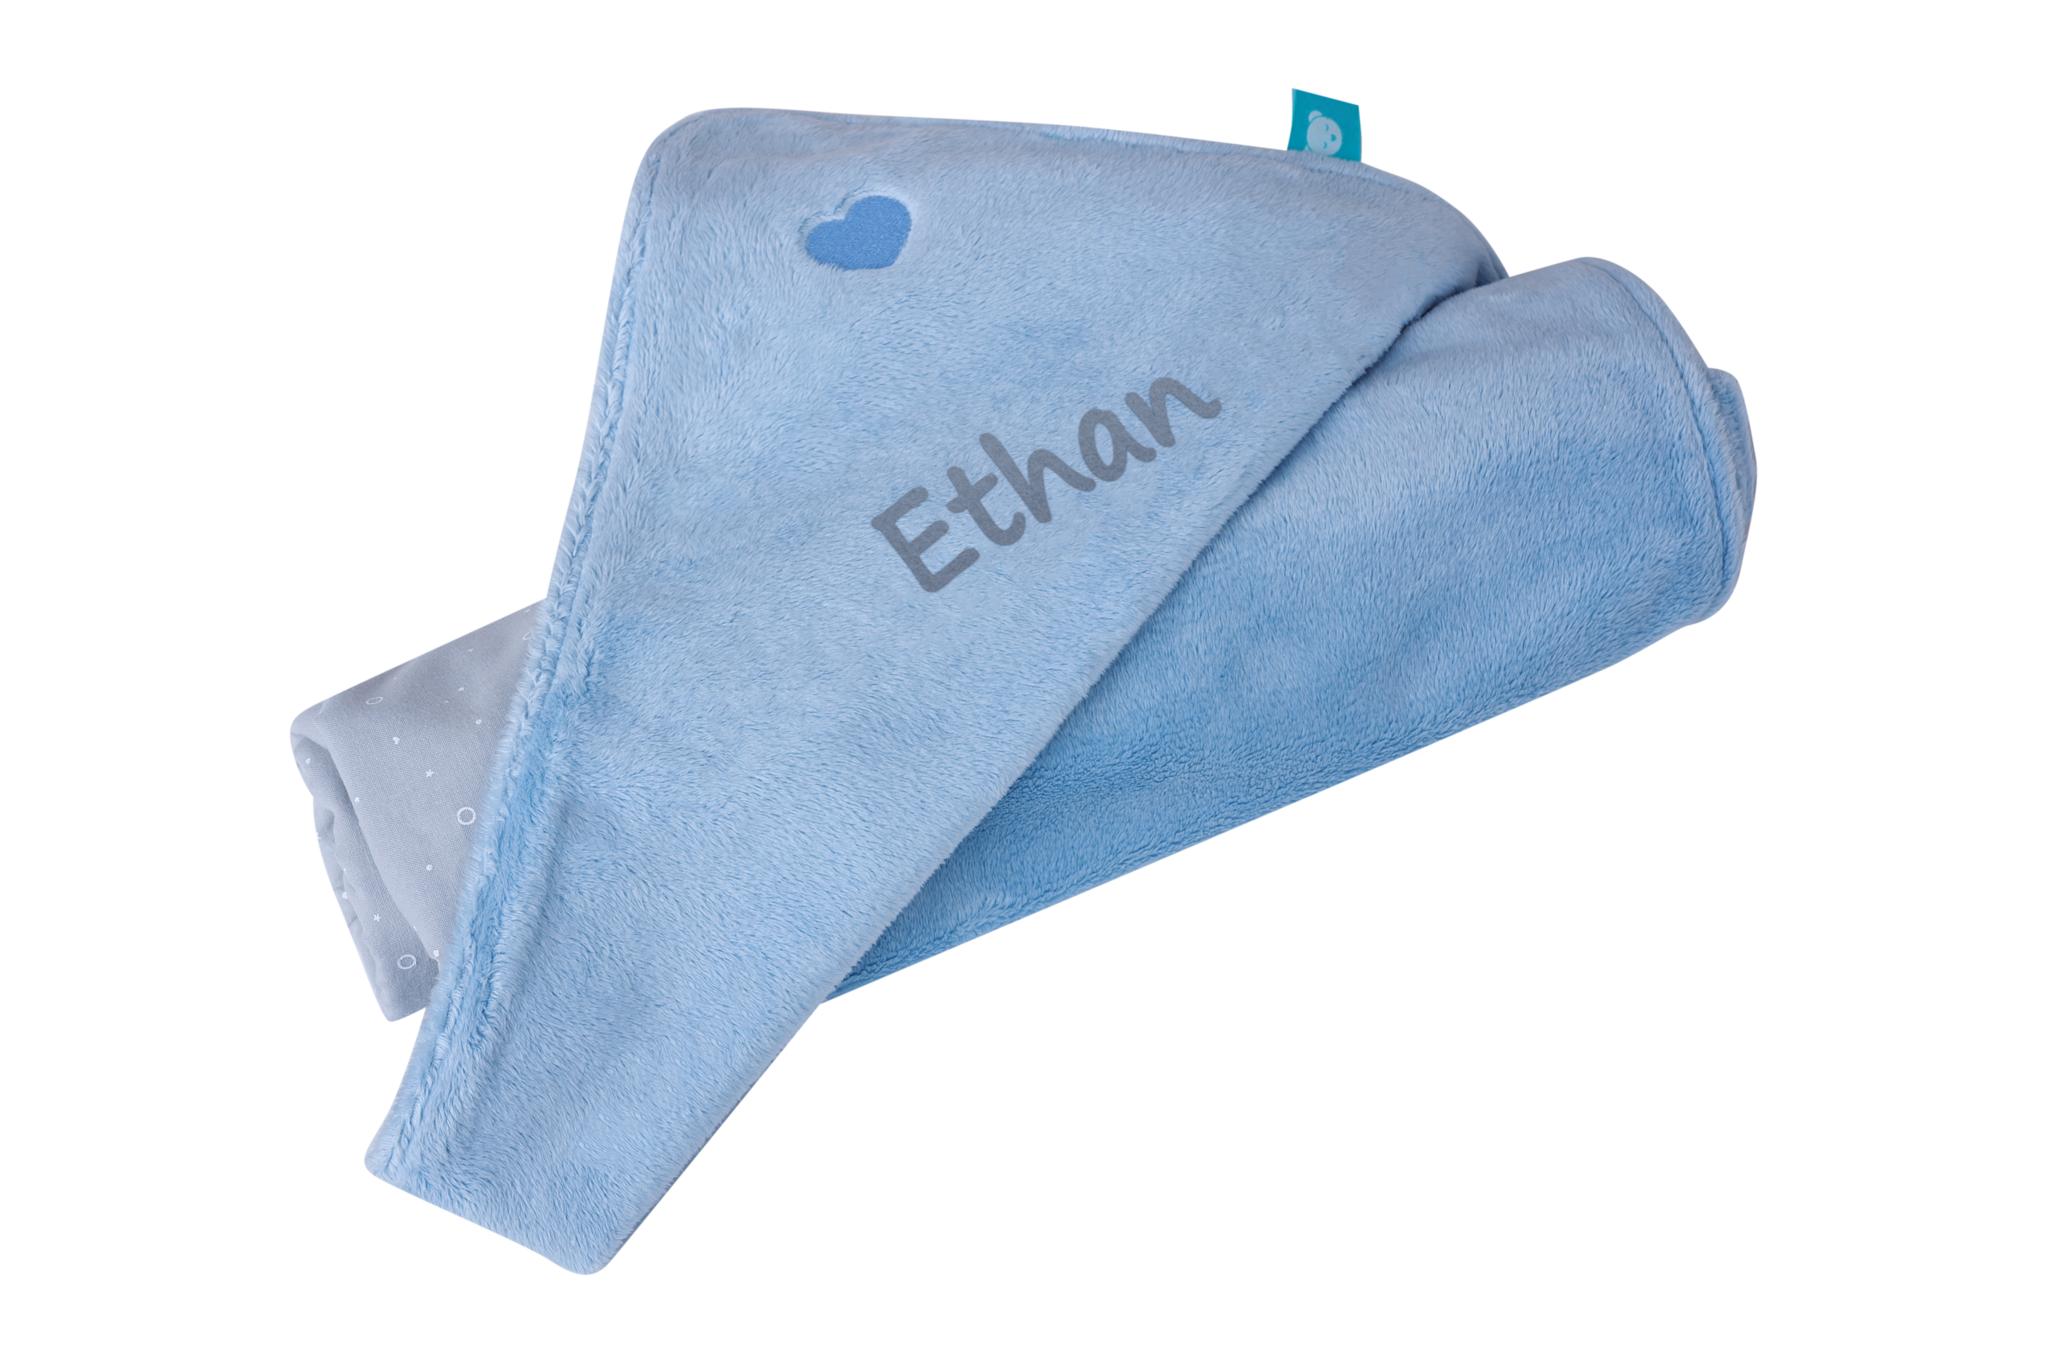 myHummy The Sleepthearts' Favorite Blanket - blue/grey